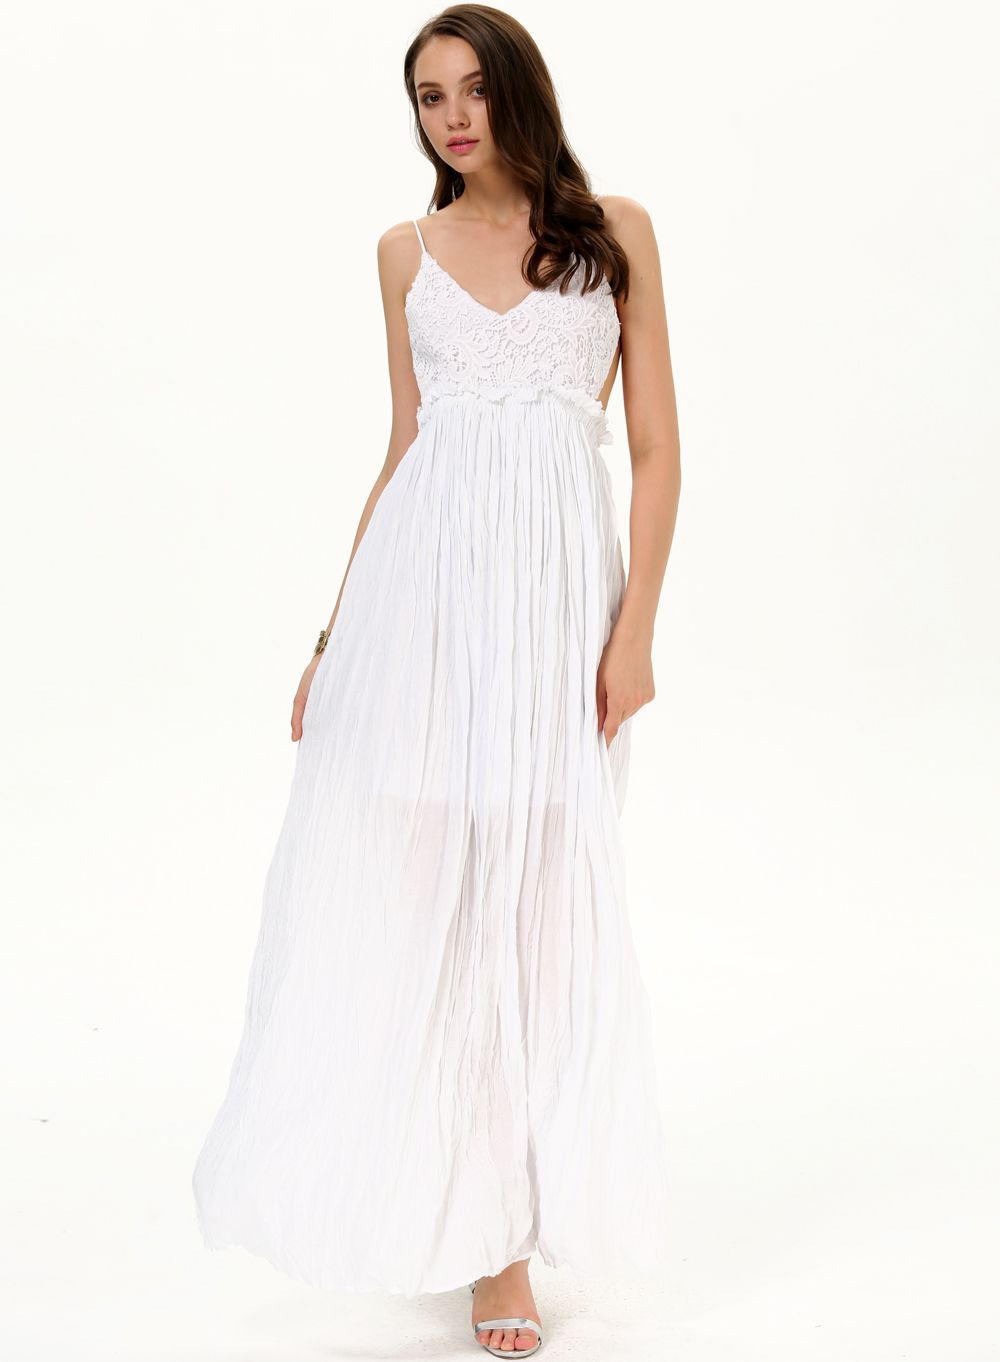 Whitelongmaxidress white maxi dress pinterest shops maxi